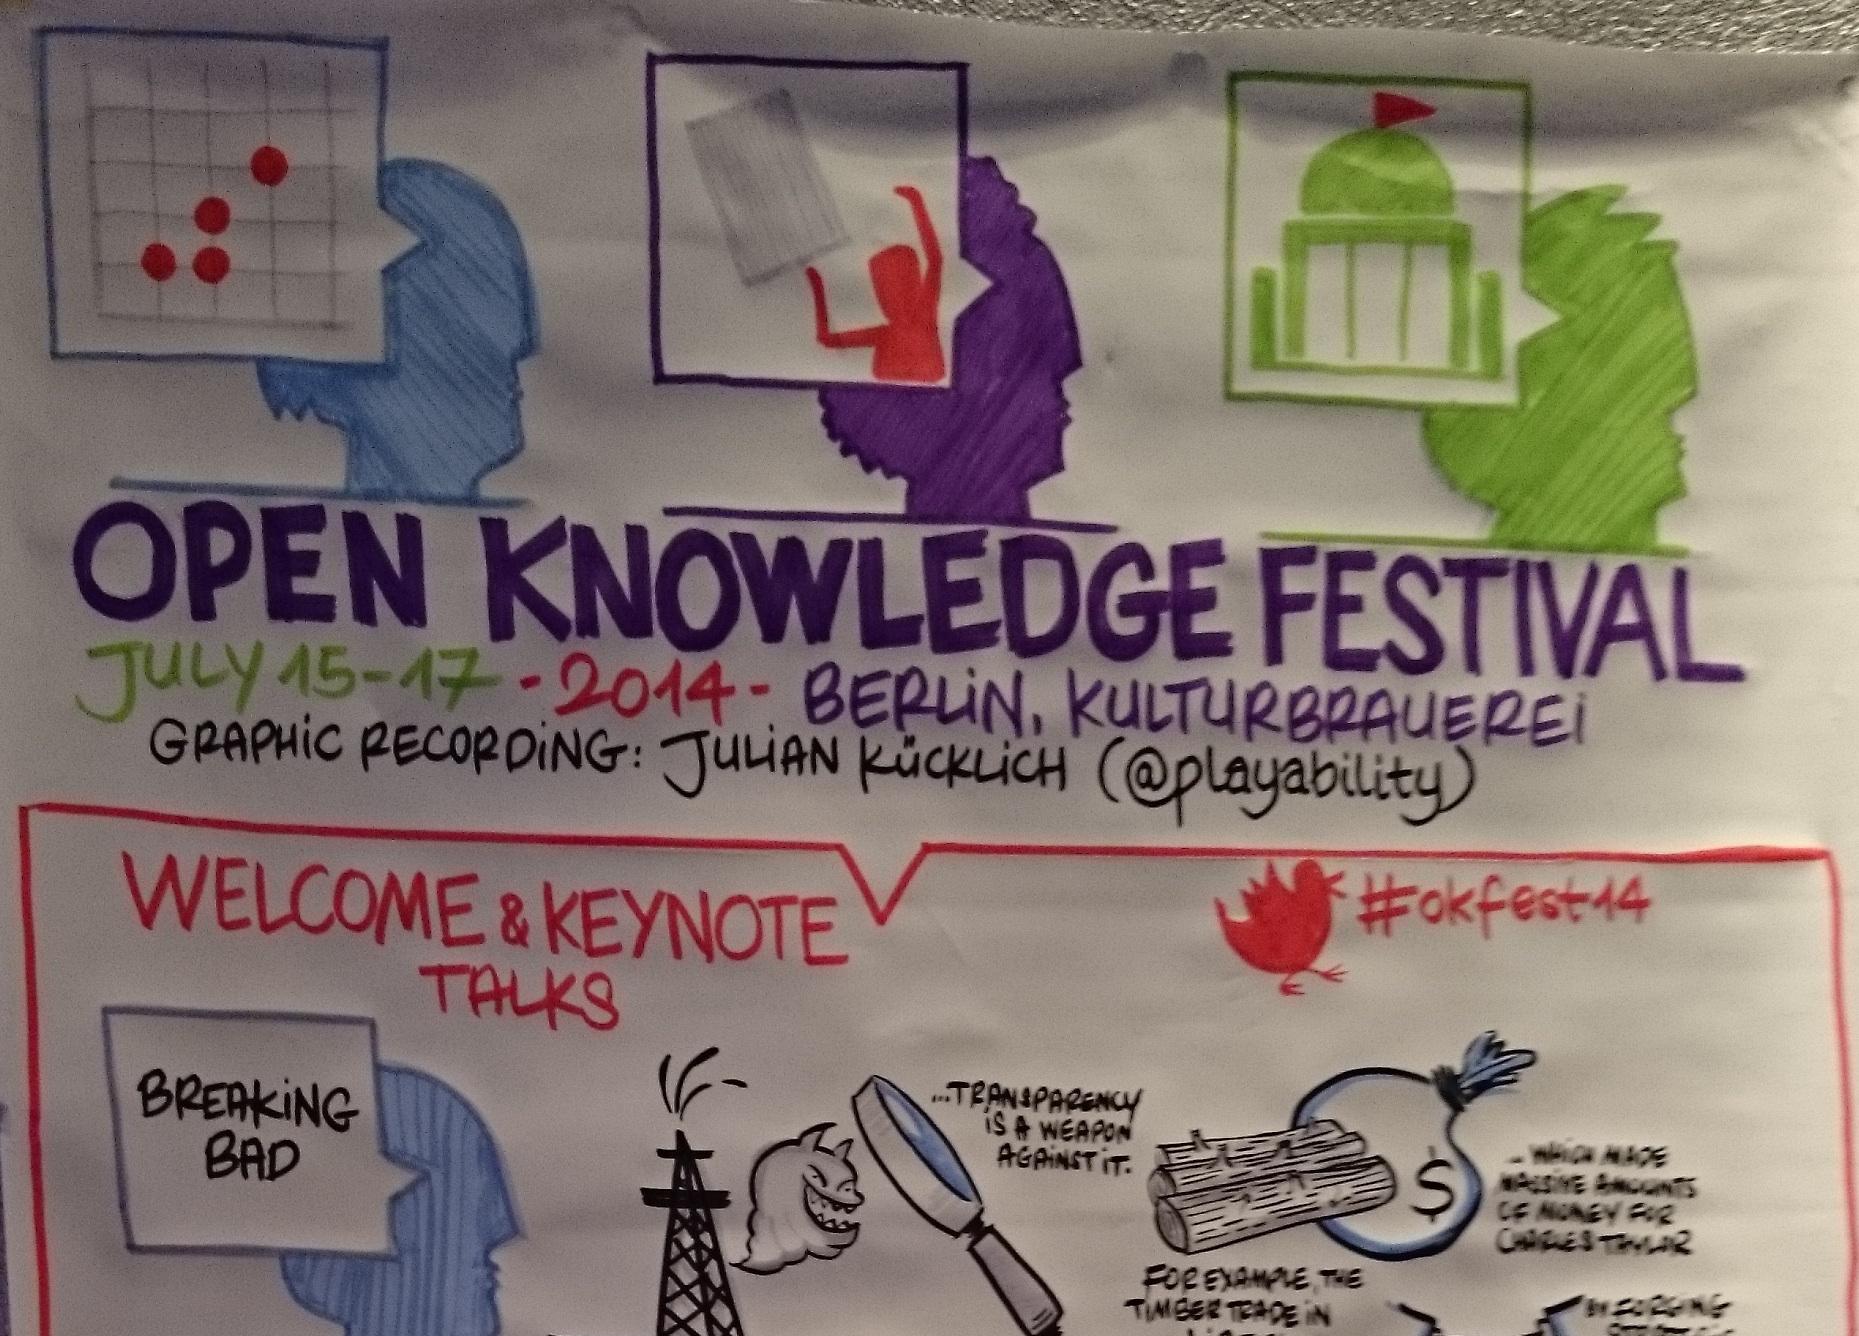 Фестиваль открытых знаний (#OKfest14 )